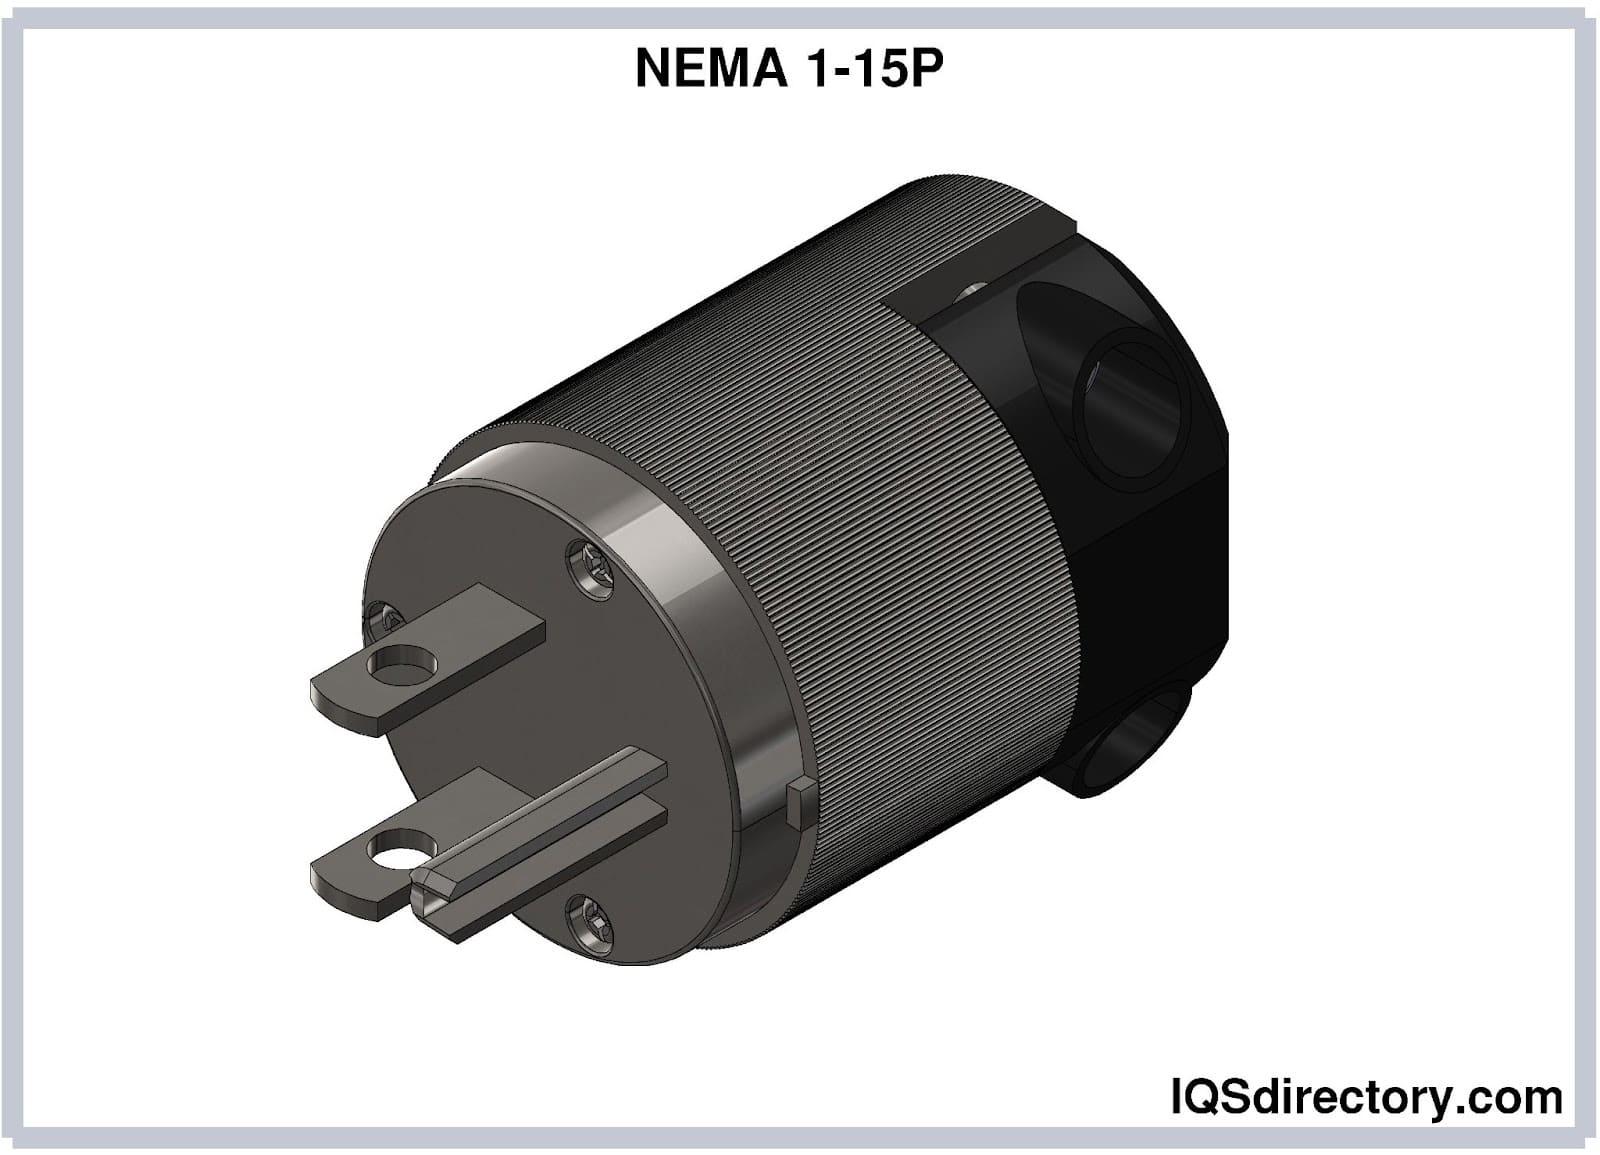 NEMA 1-15P